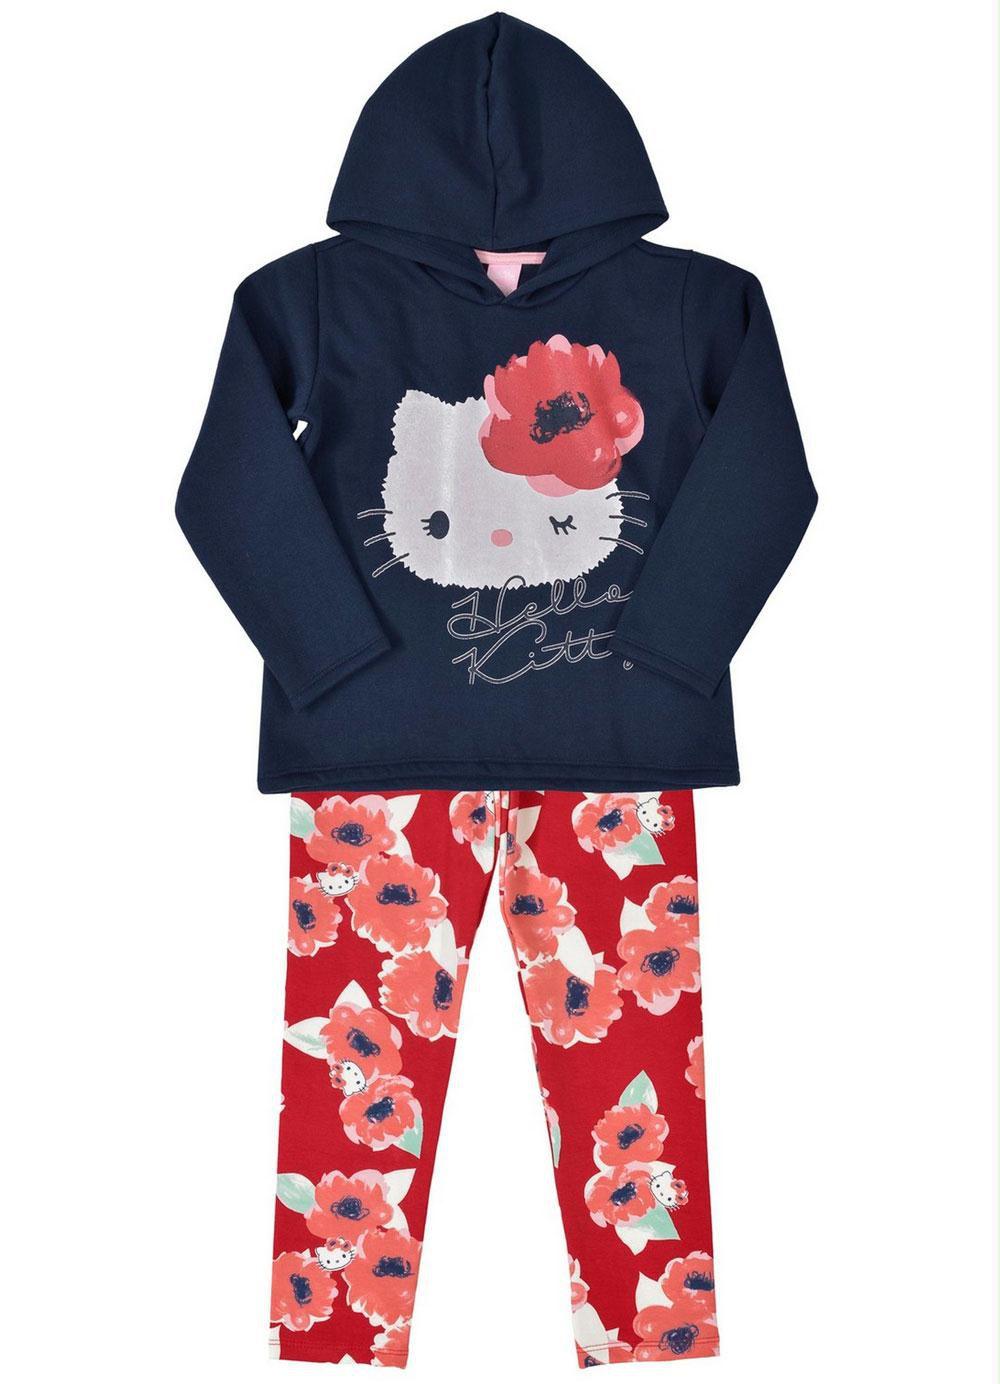 Conjunto Infantil Inverno Calça Floral - 2 peças - Hello Kitty